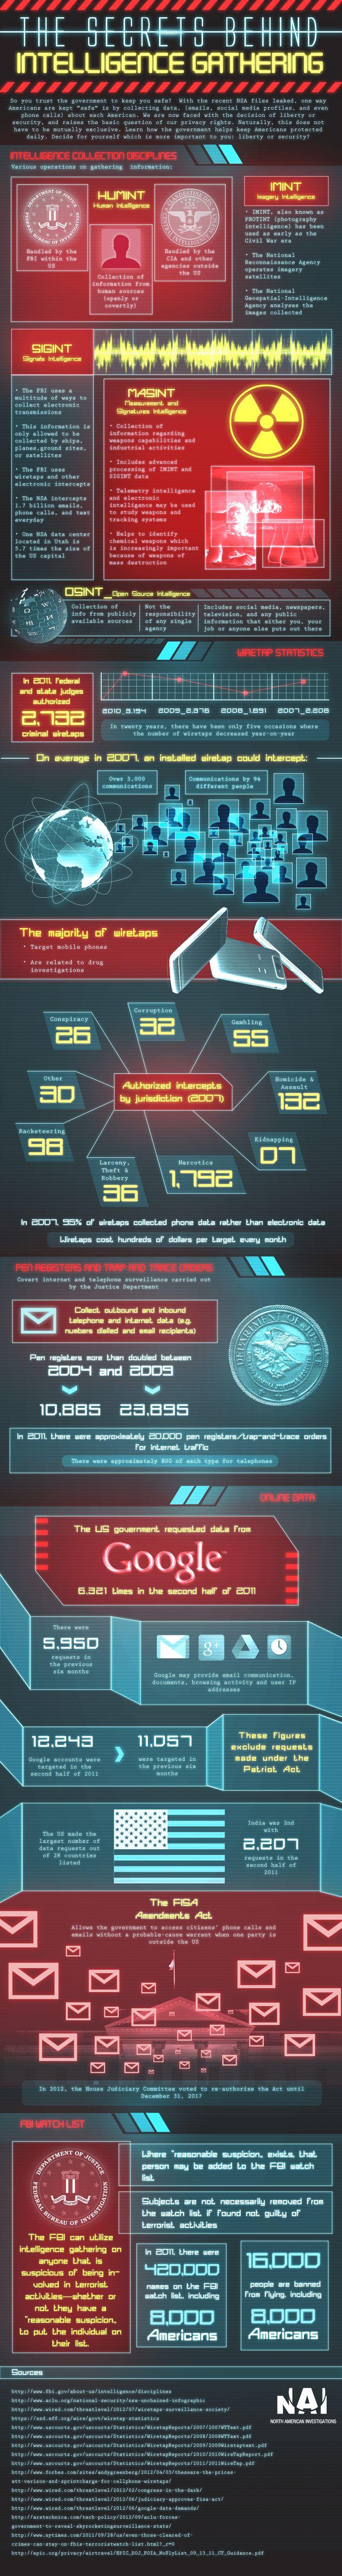 the-secrets-behind-intelligence-gathering-infographic-(3)